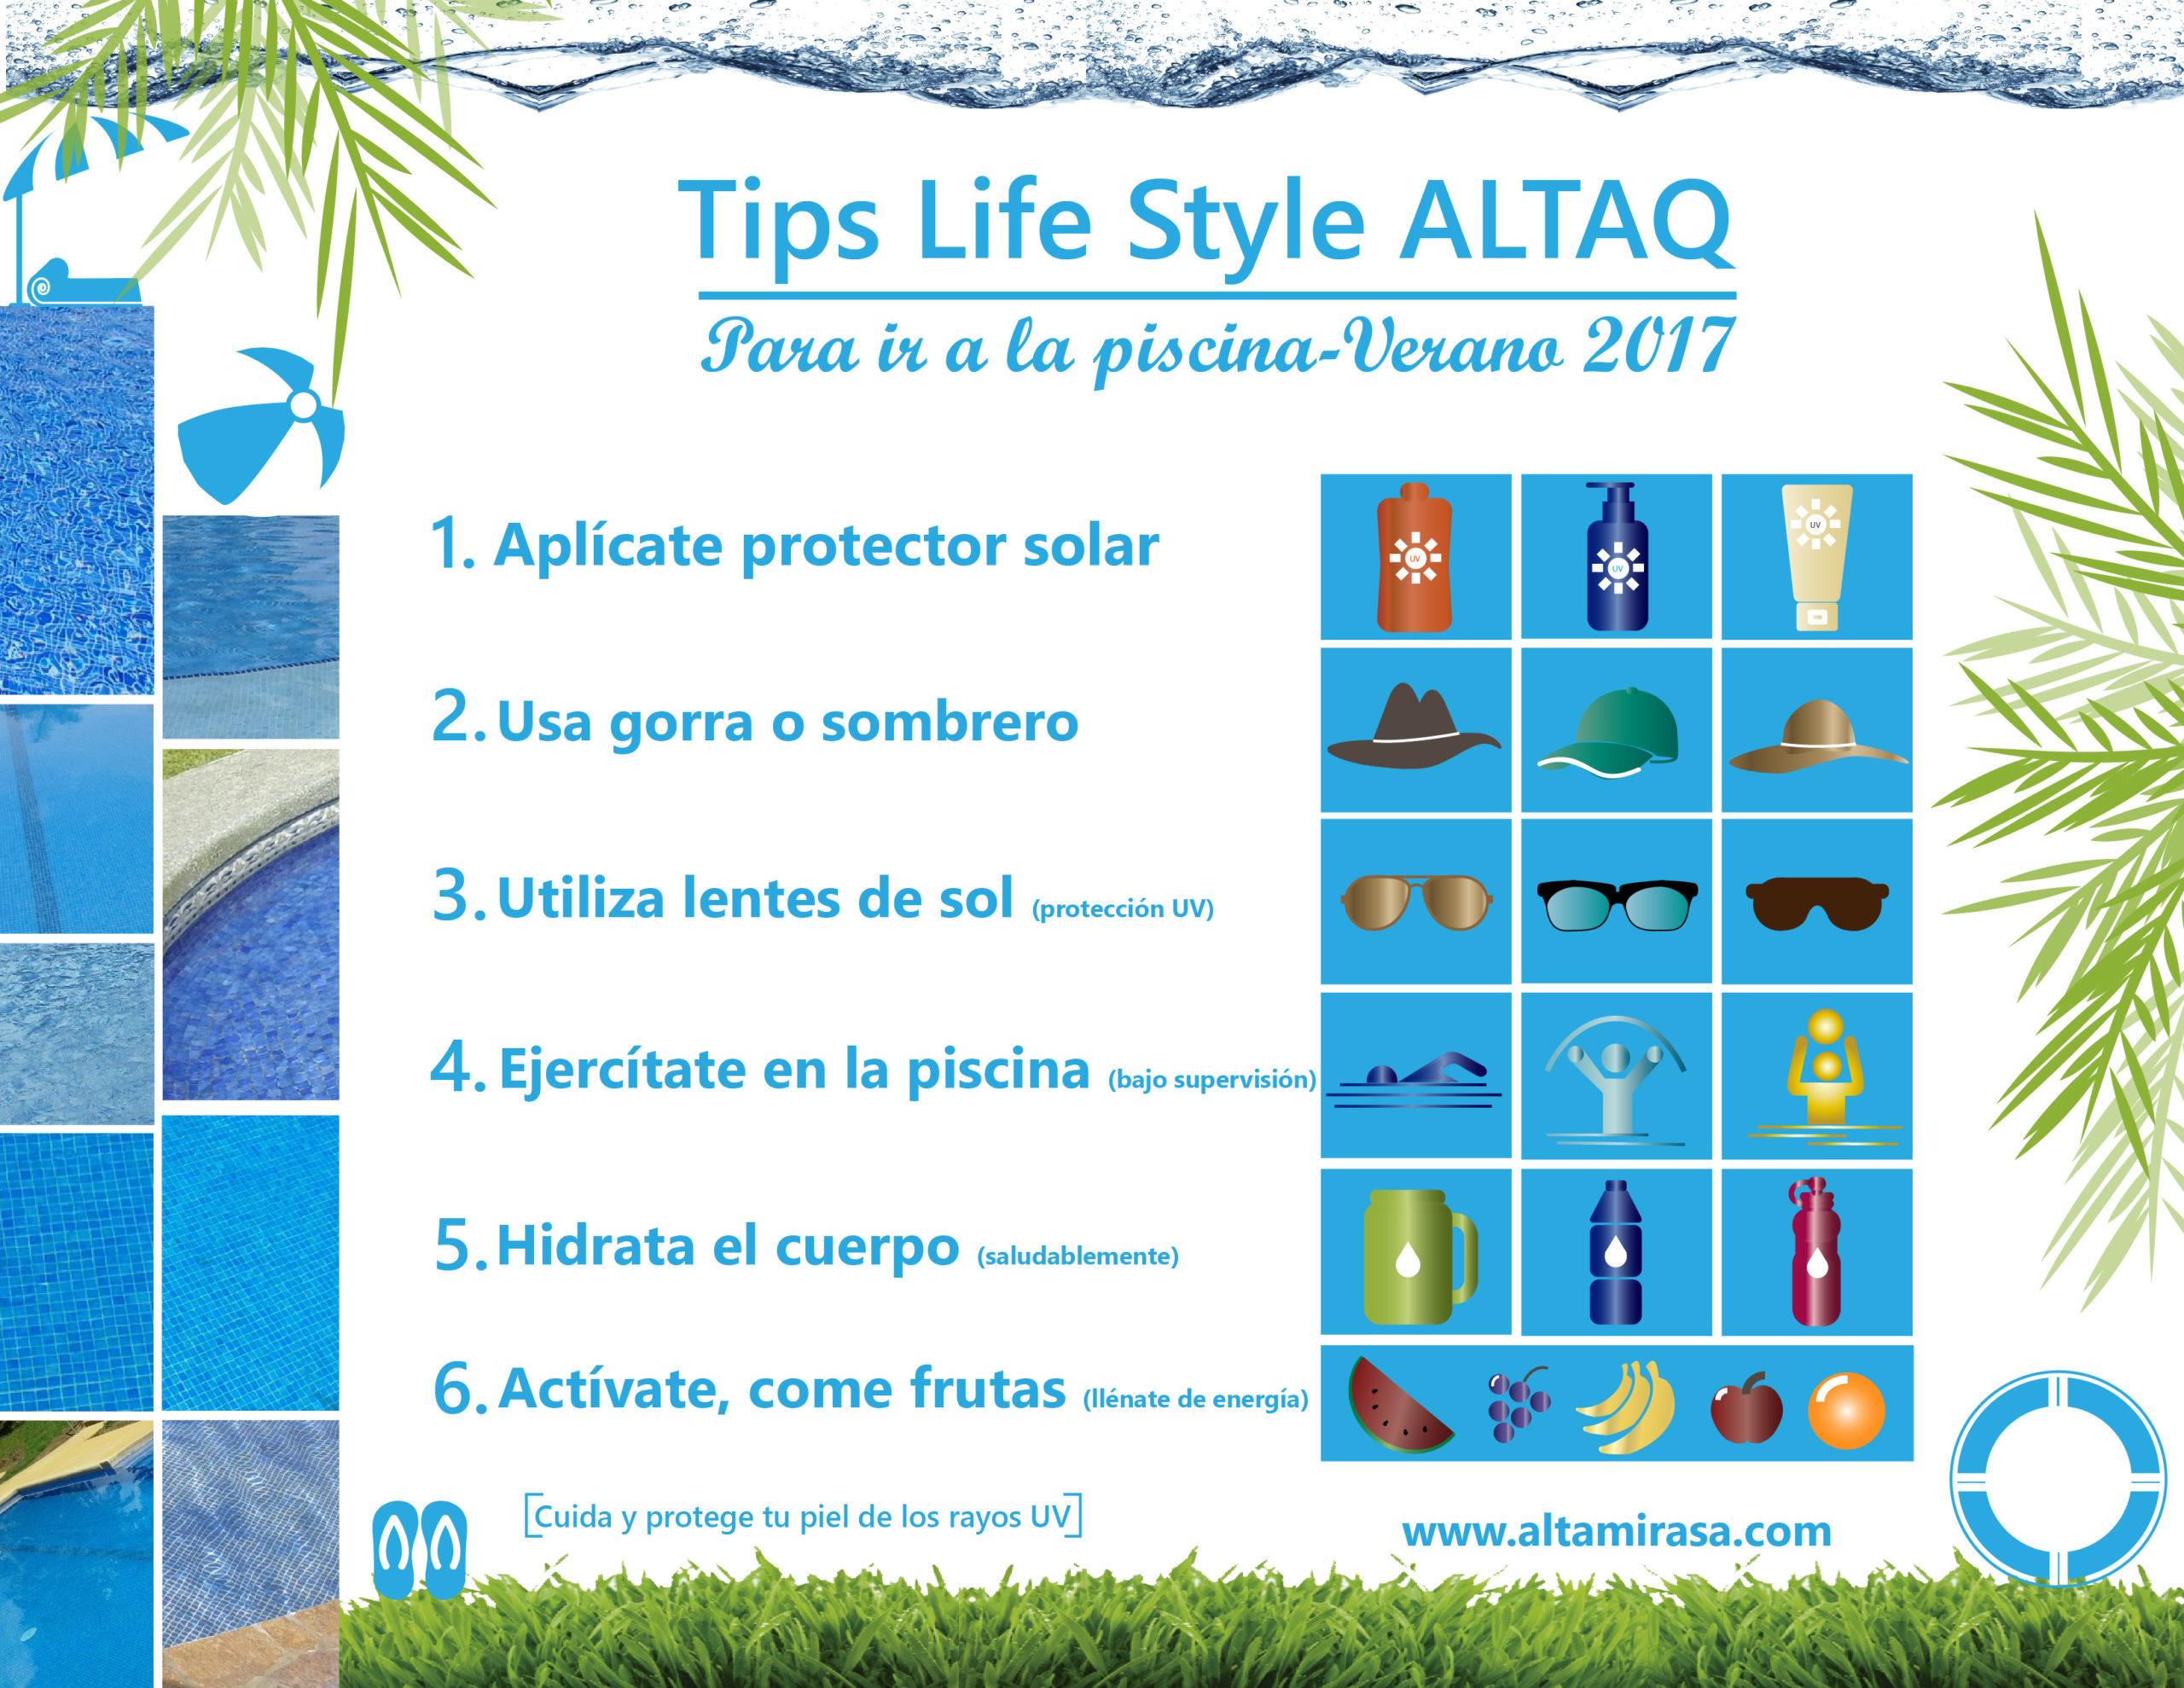 Tips Life Style ALTAQ para ir a las piscinas